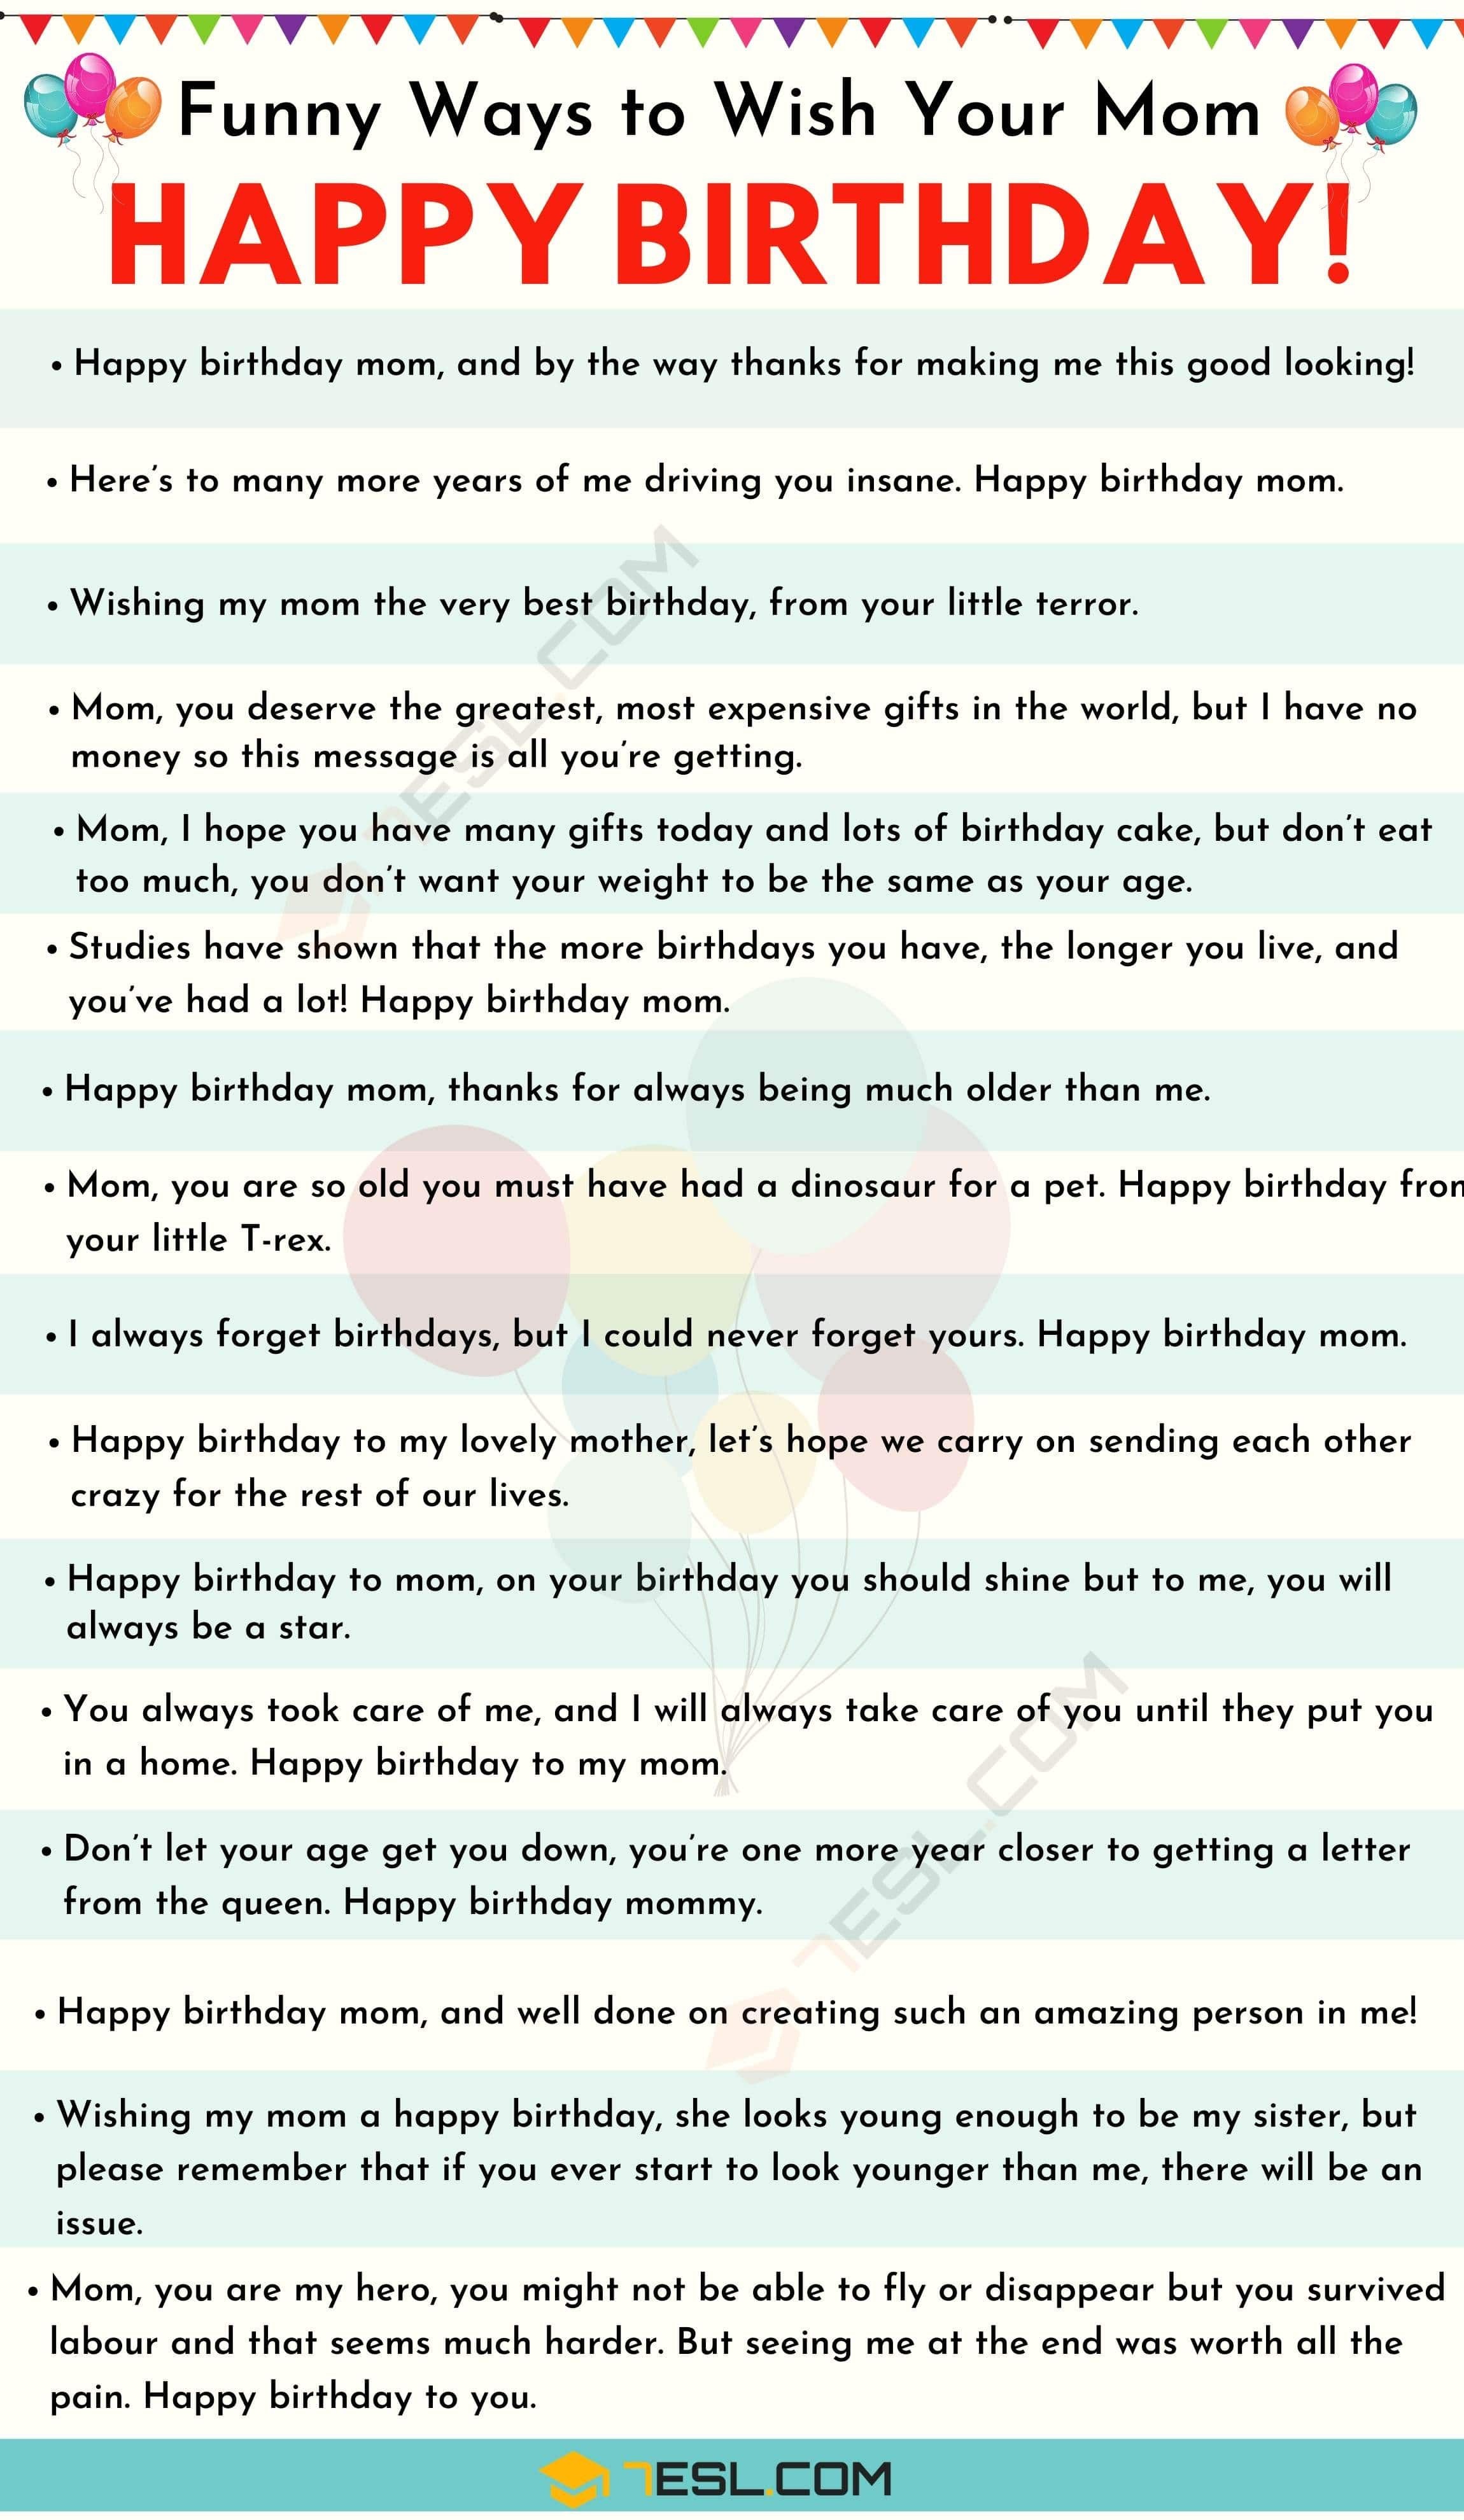 Happy Birthday Mom 35 Sweet And Funny Birthday Wishes For Mom 7esl Birthday Wishes For Mom Birthday Wishes Funny Happy Birthday Wishes Quotes